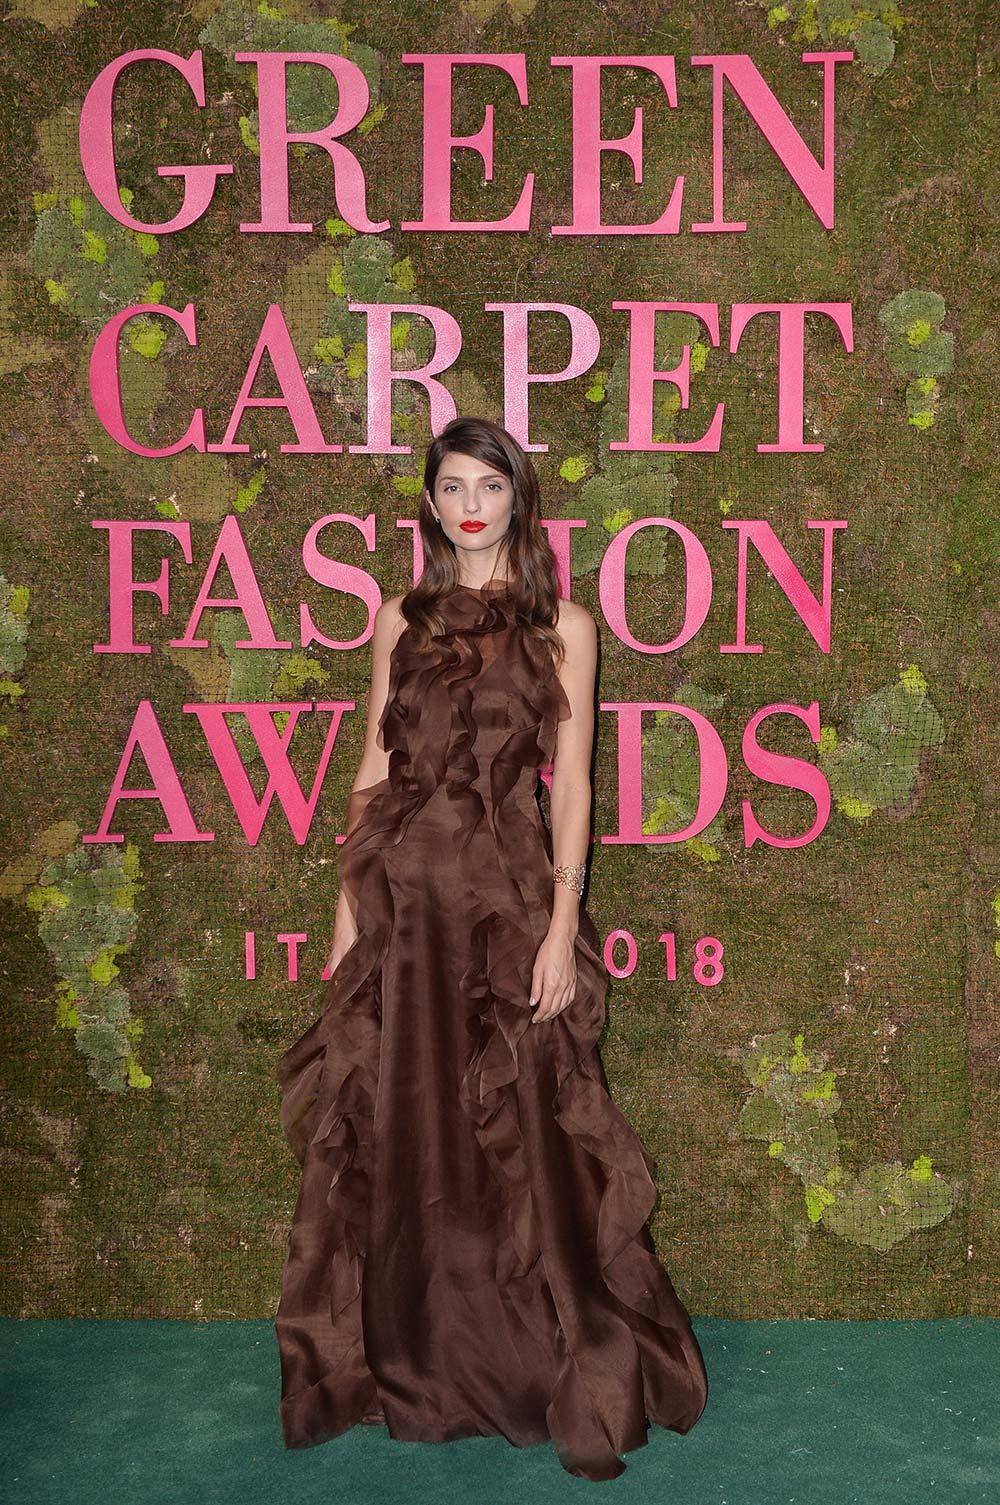 Green Carpet Fashion Awards 2018 - Annabelle Belmondo - Hair & Makeup Massimo Serini Team